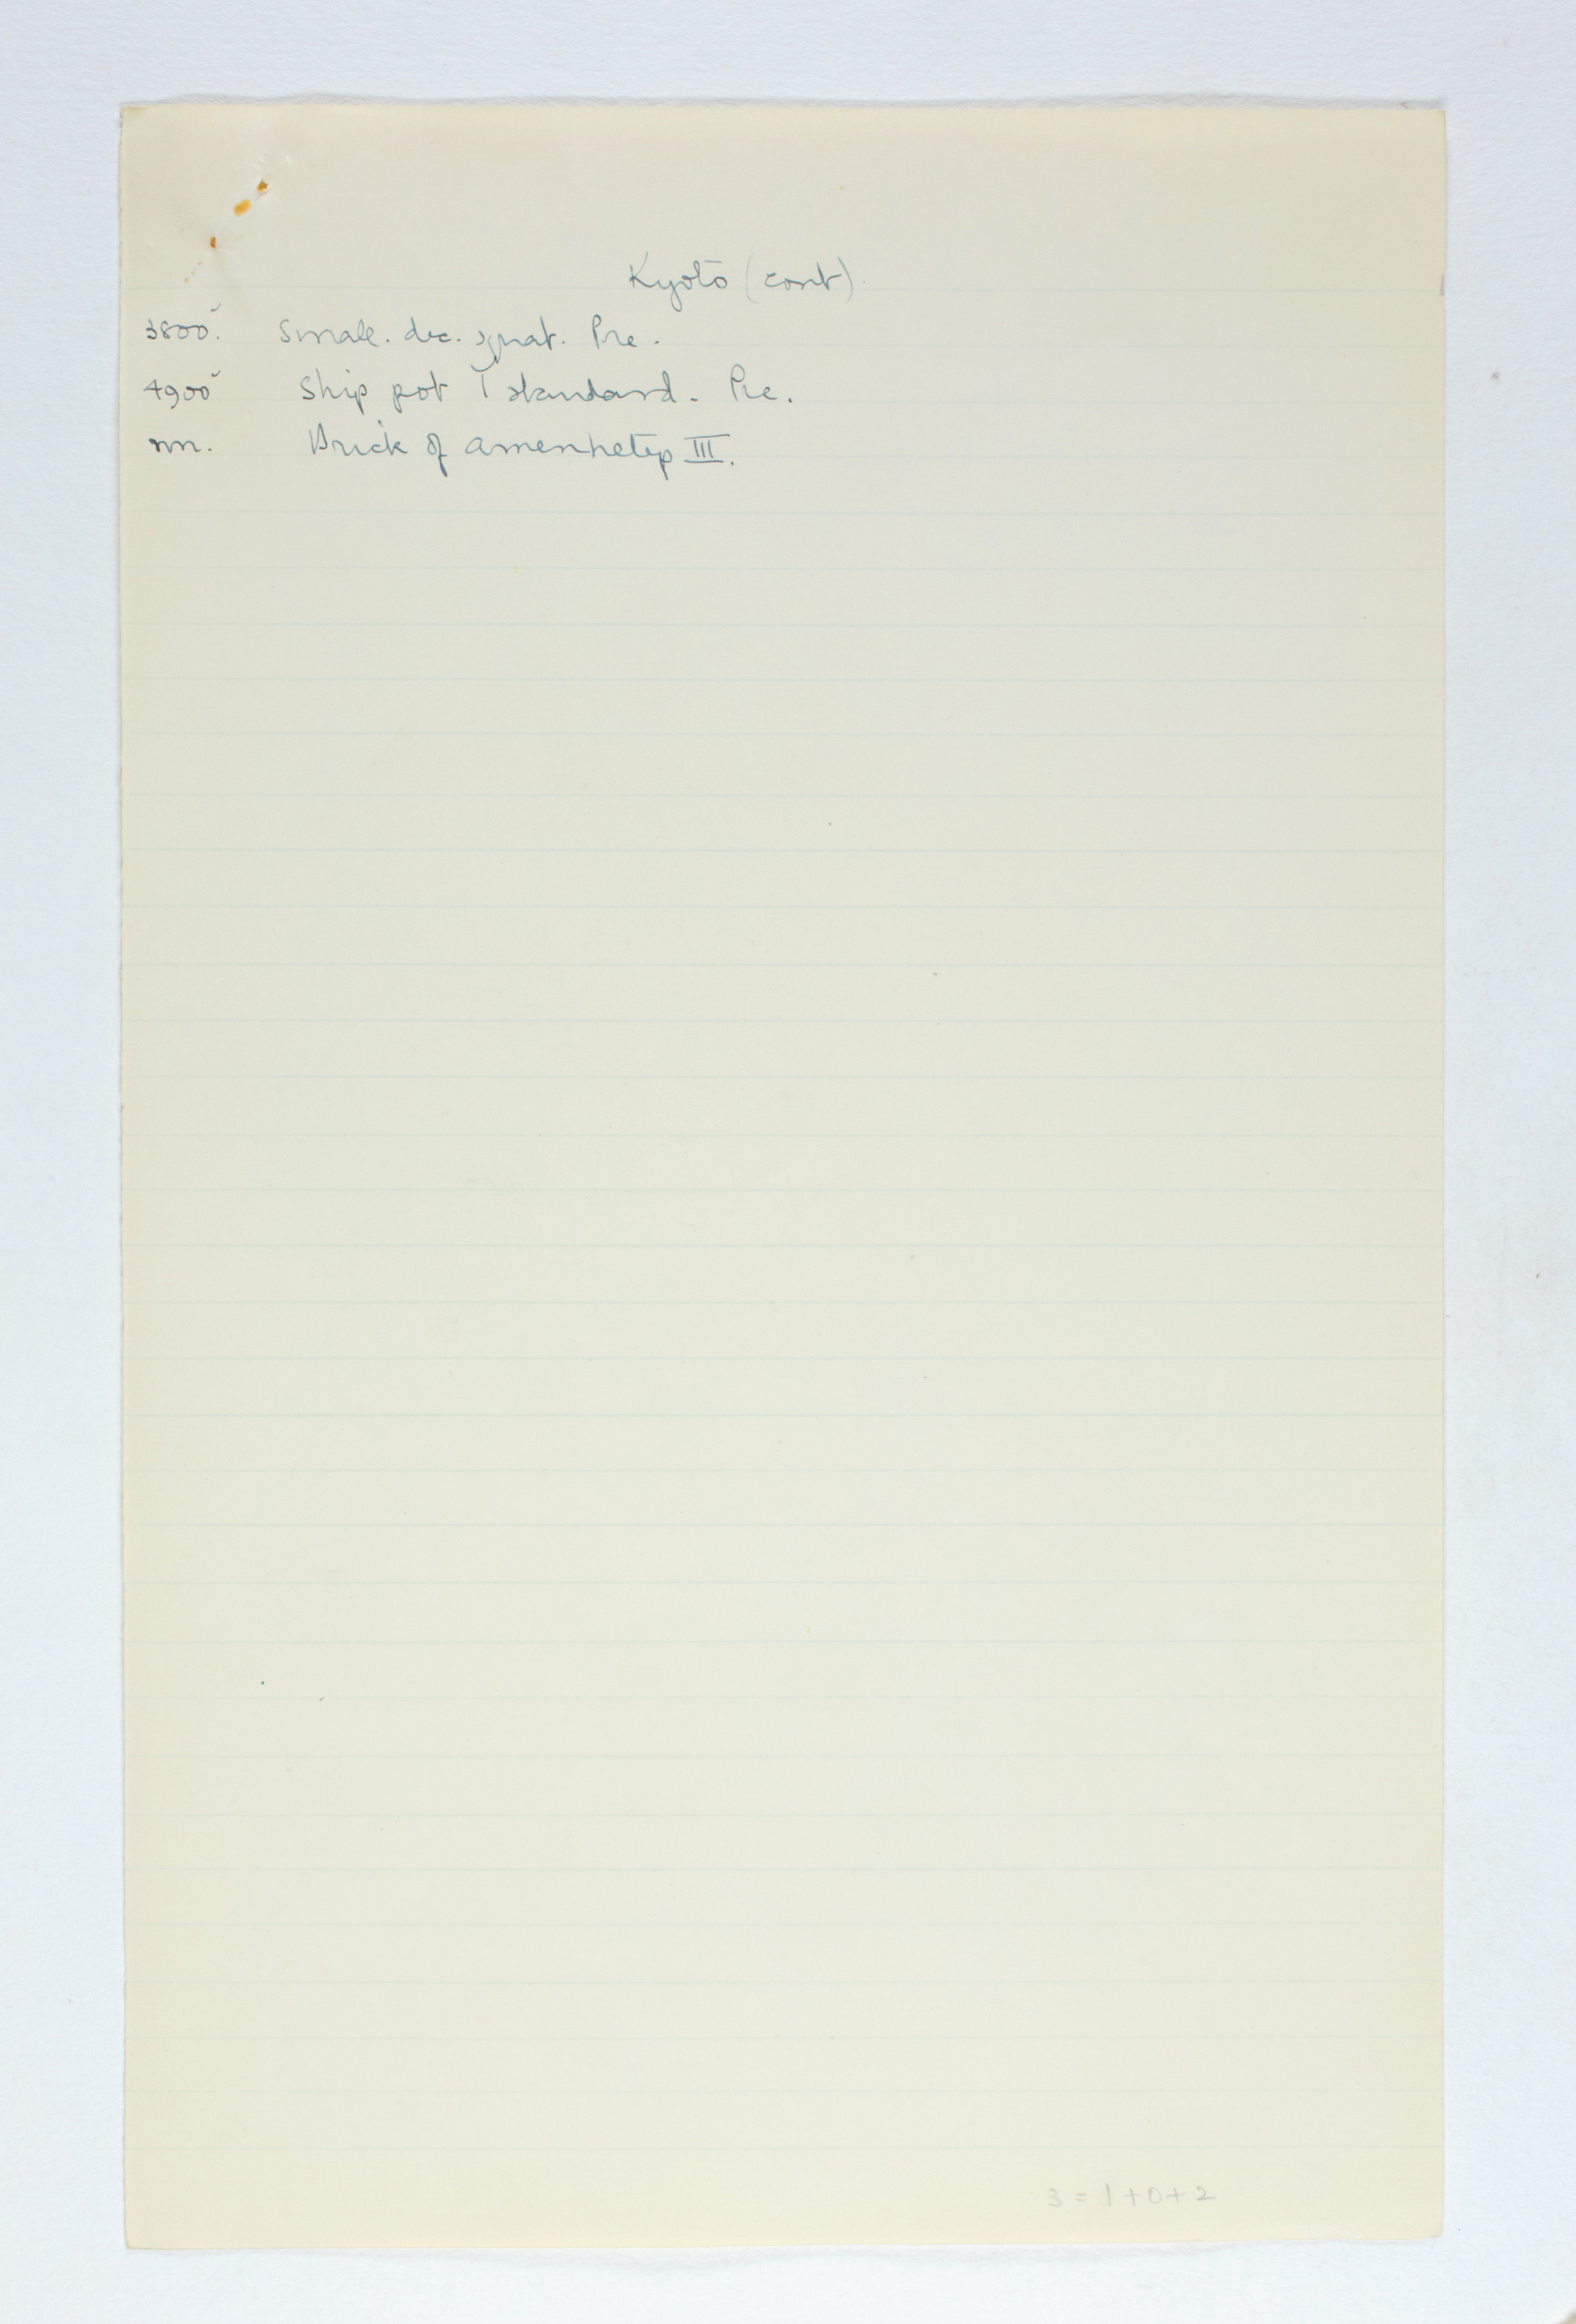 1923-24 Qau el-Kebir, Hemamieh Individual institution list PMA/WFP1/D/27/14.4